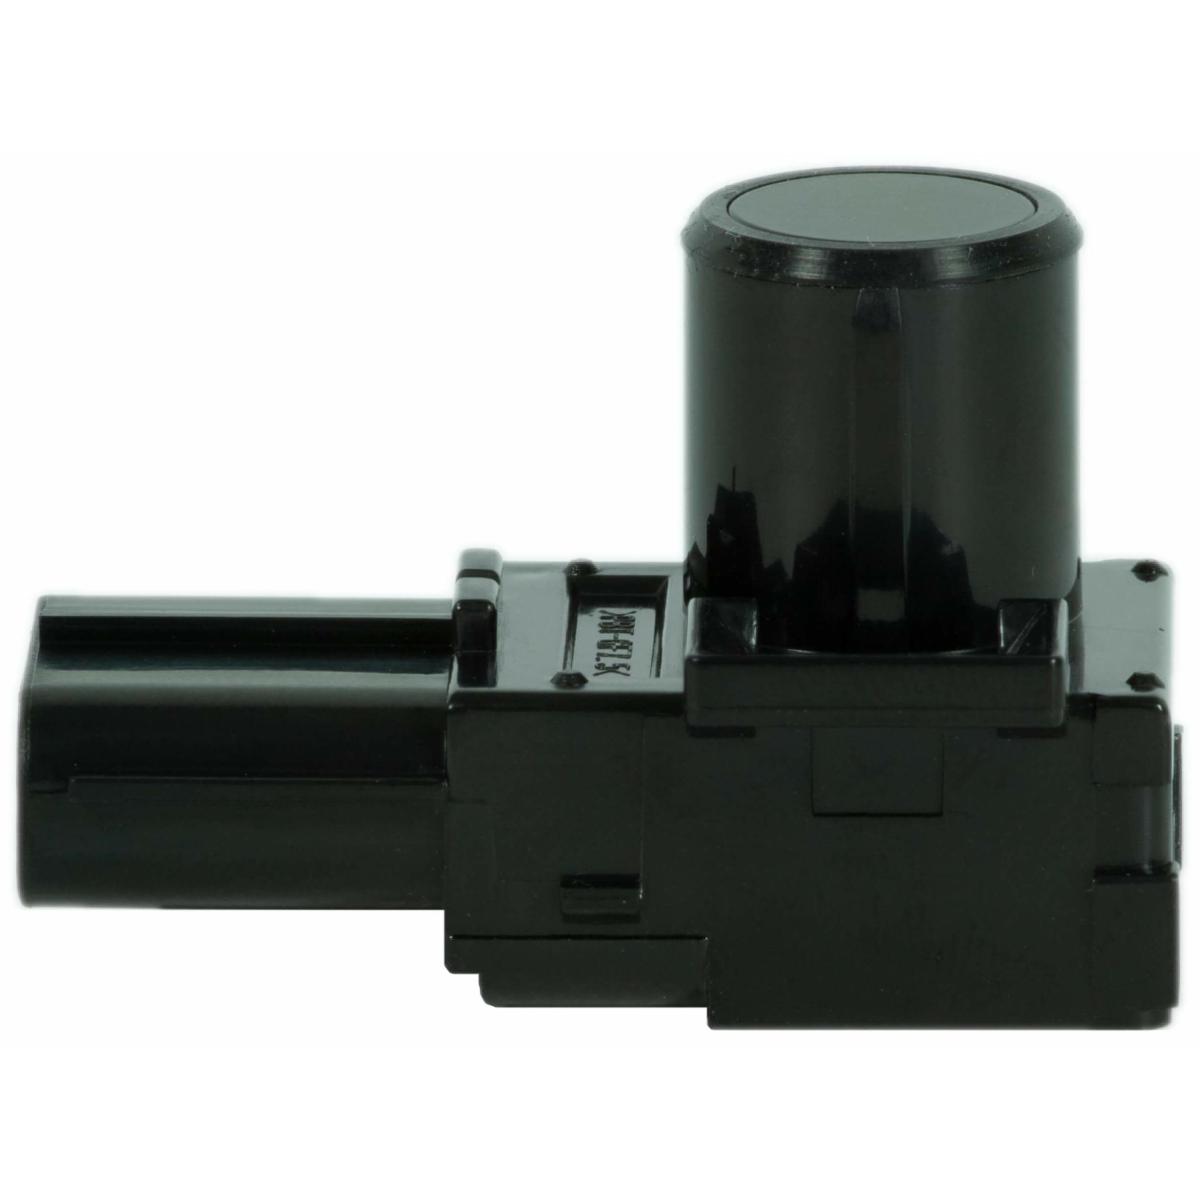 Park sensor 89341-33160 for Toyota, Lexus PDC Parktronic